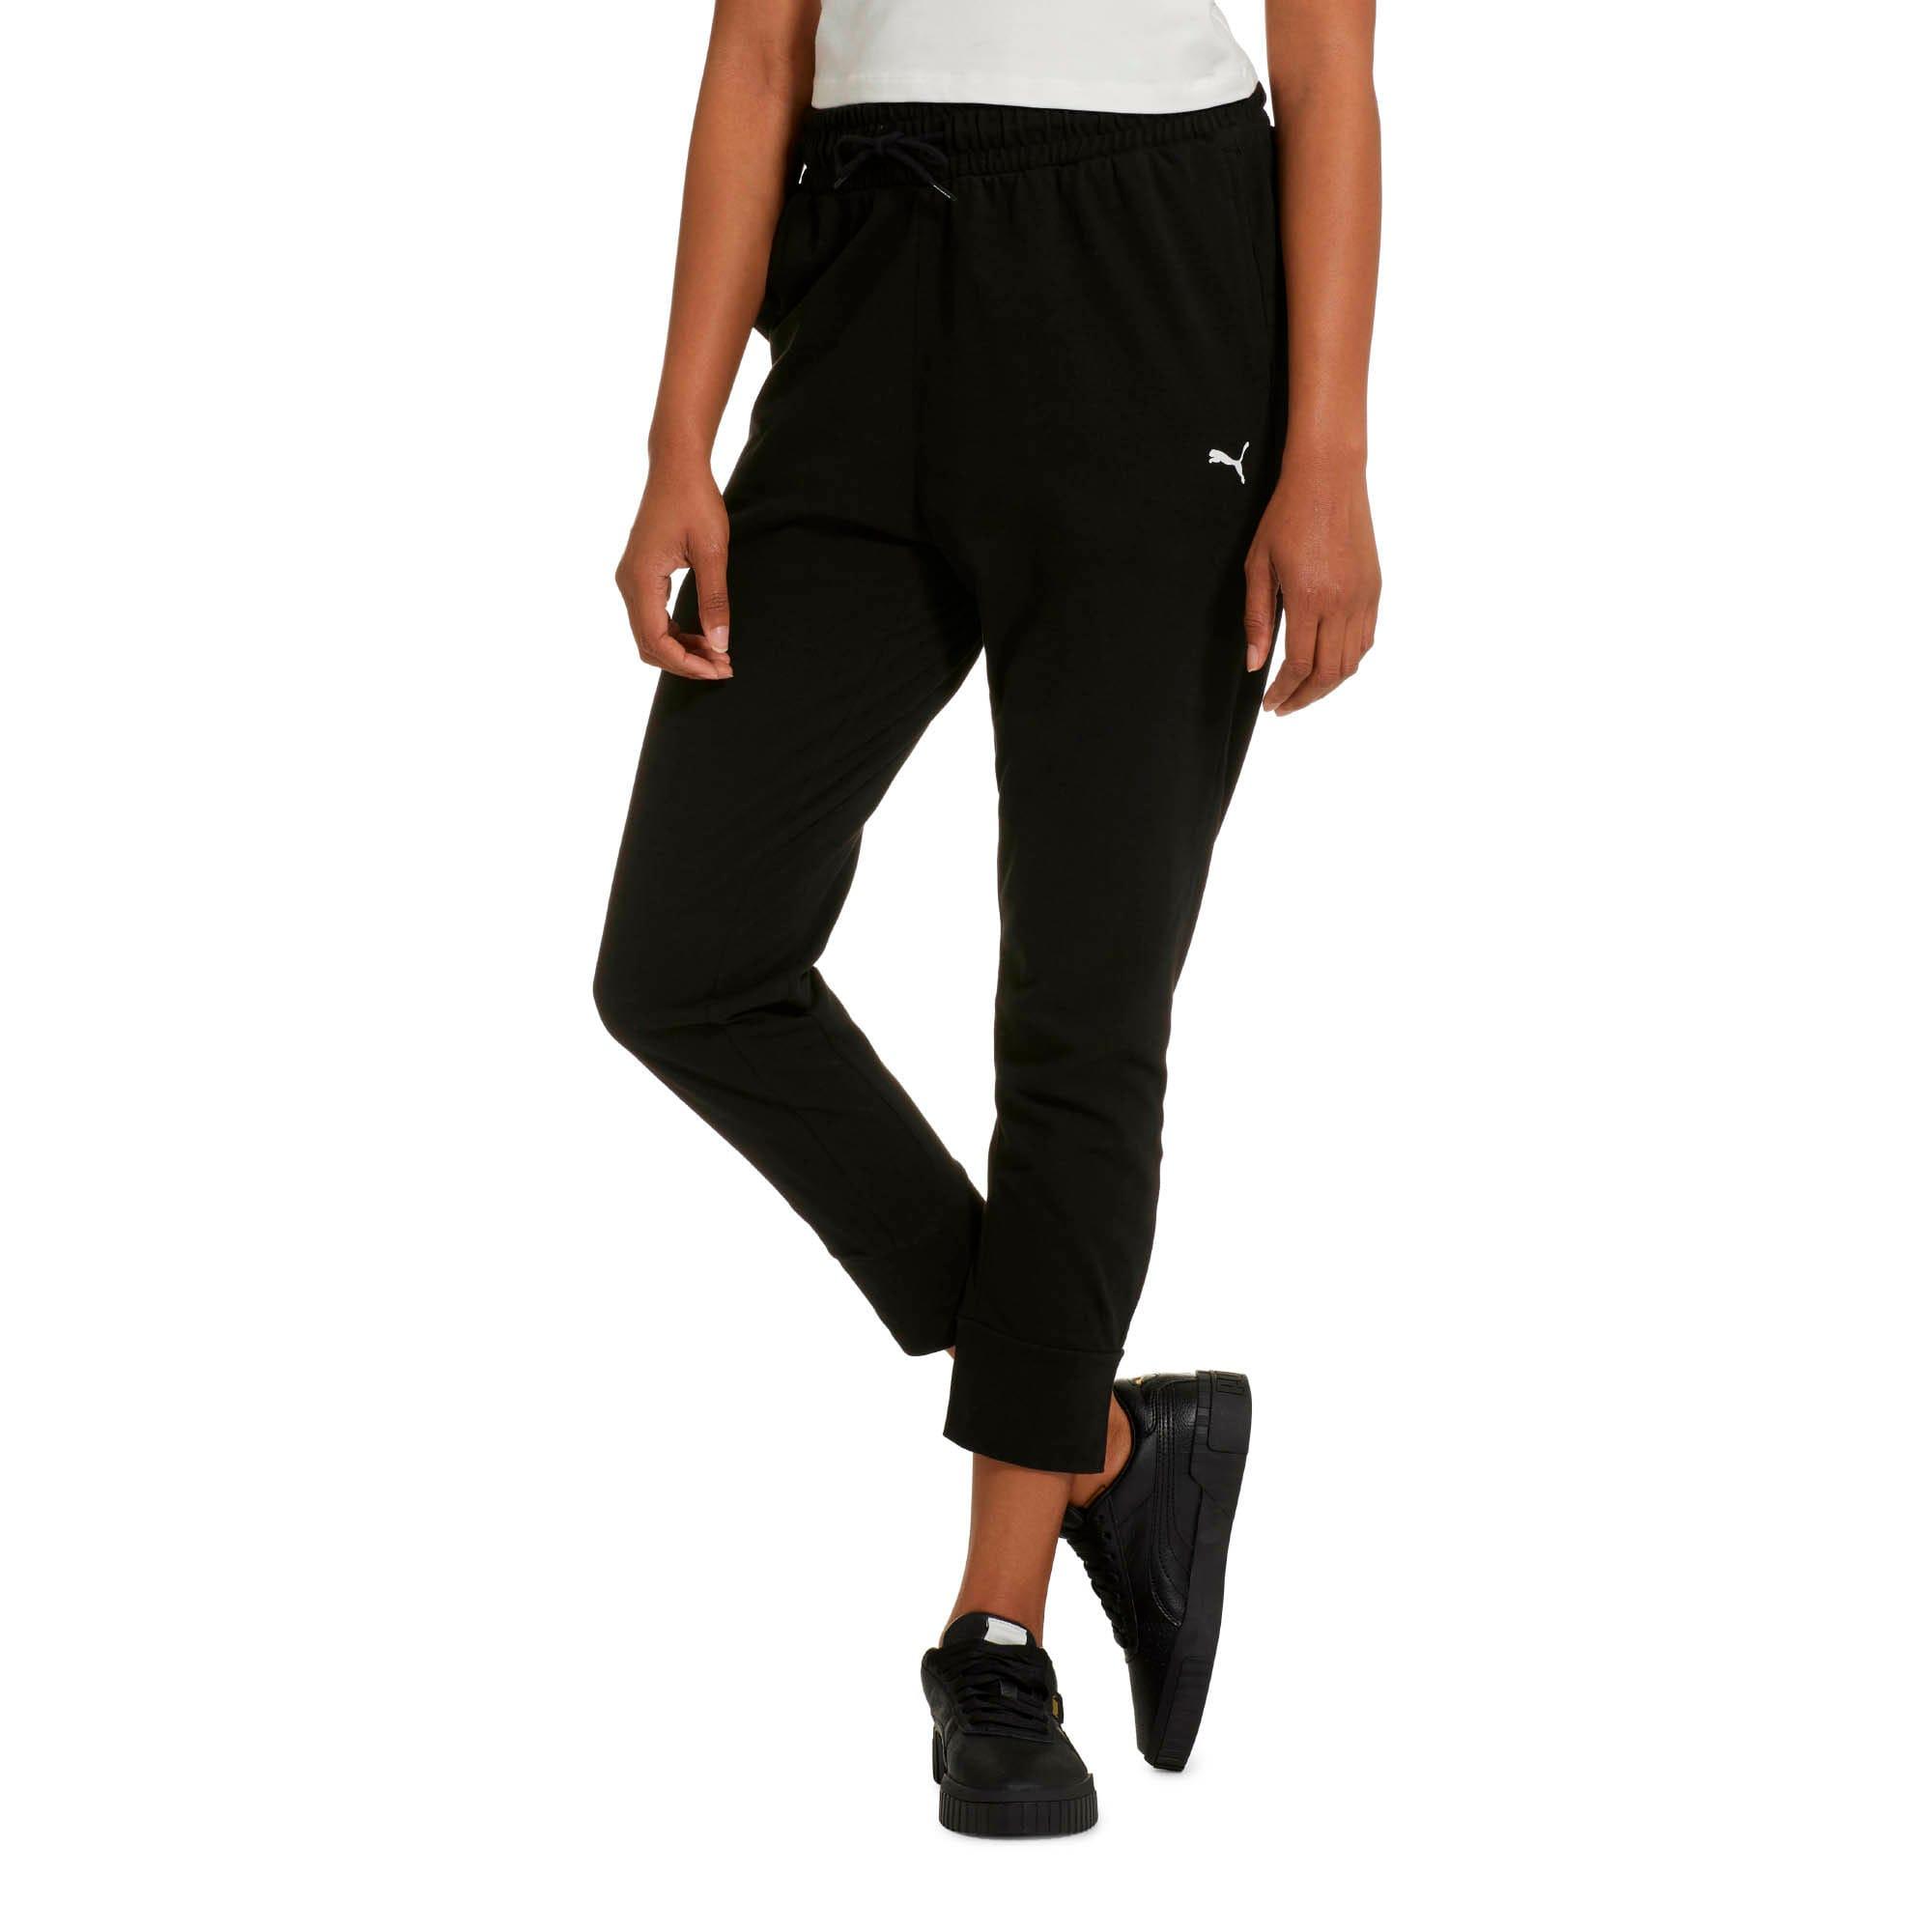 Thumbnail 2 of Women's Summer Pants, Cotton Black, medium